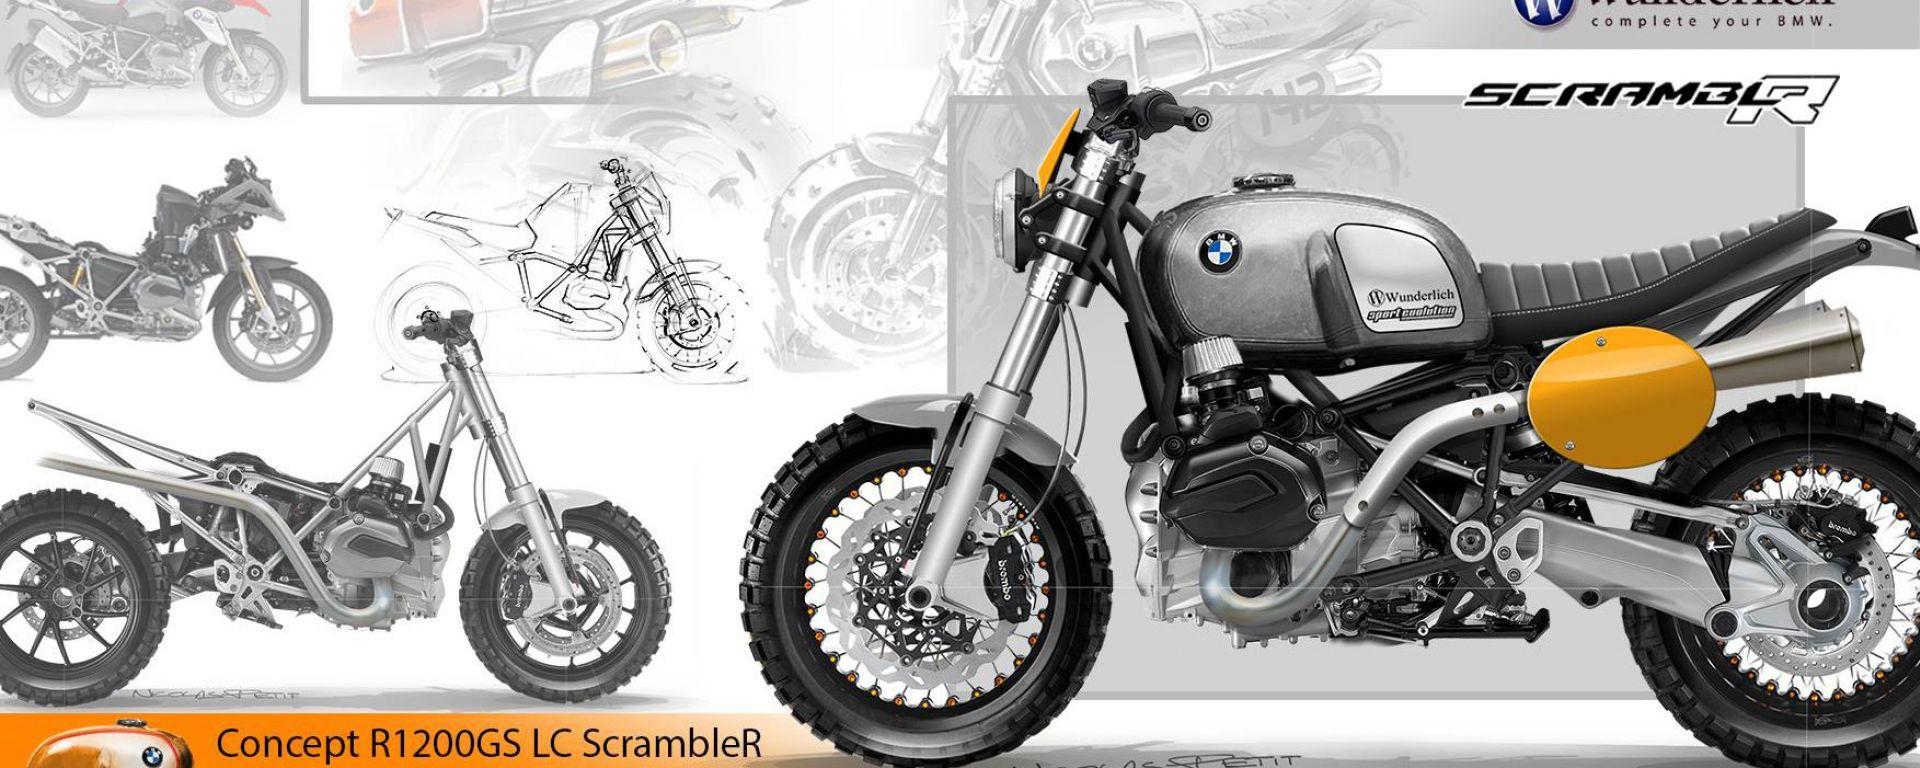 BMW R 1200 GS LC ScrambleR Concept